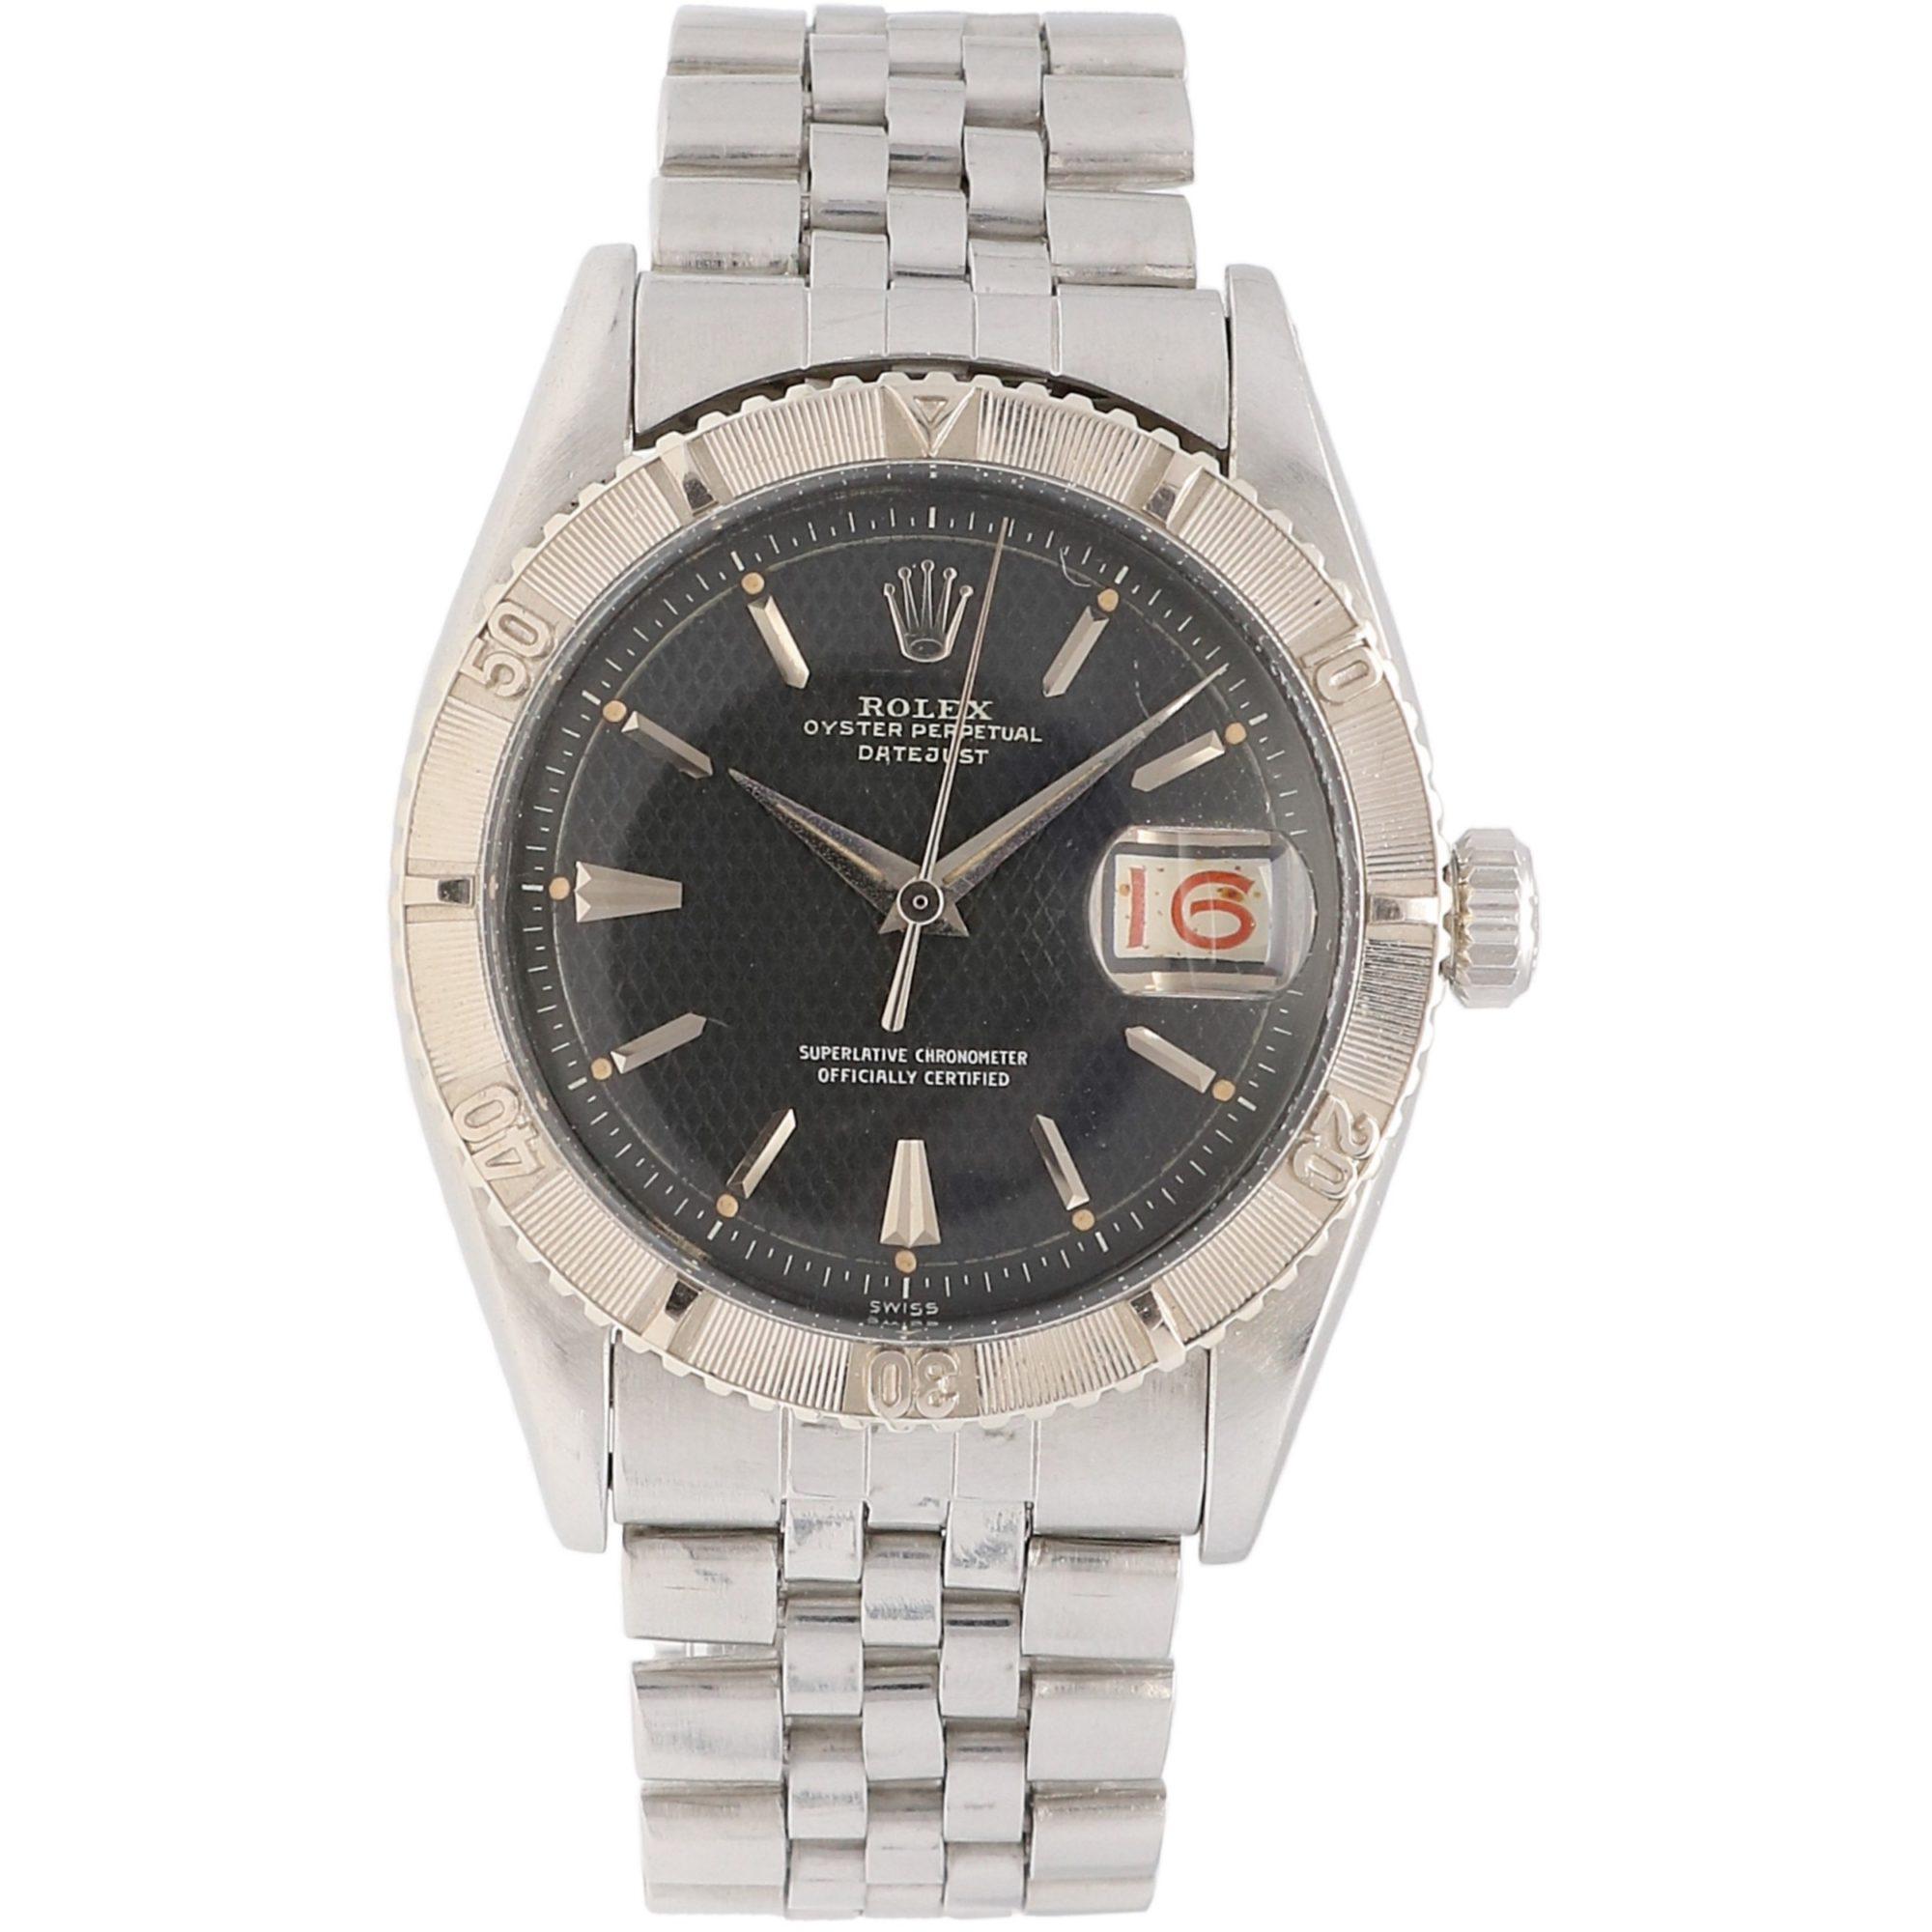 Rolex Datejust Turn-O-Graph 6609 - 1956